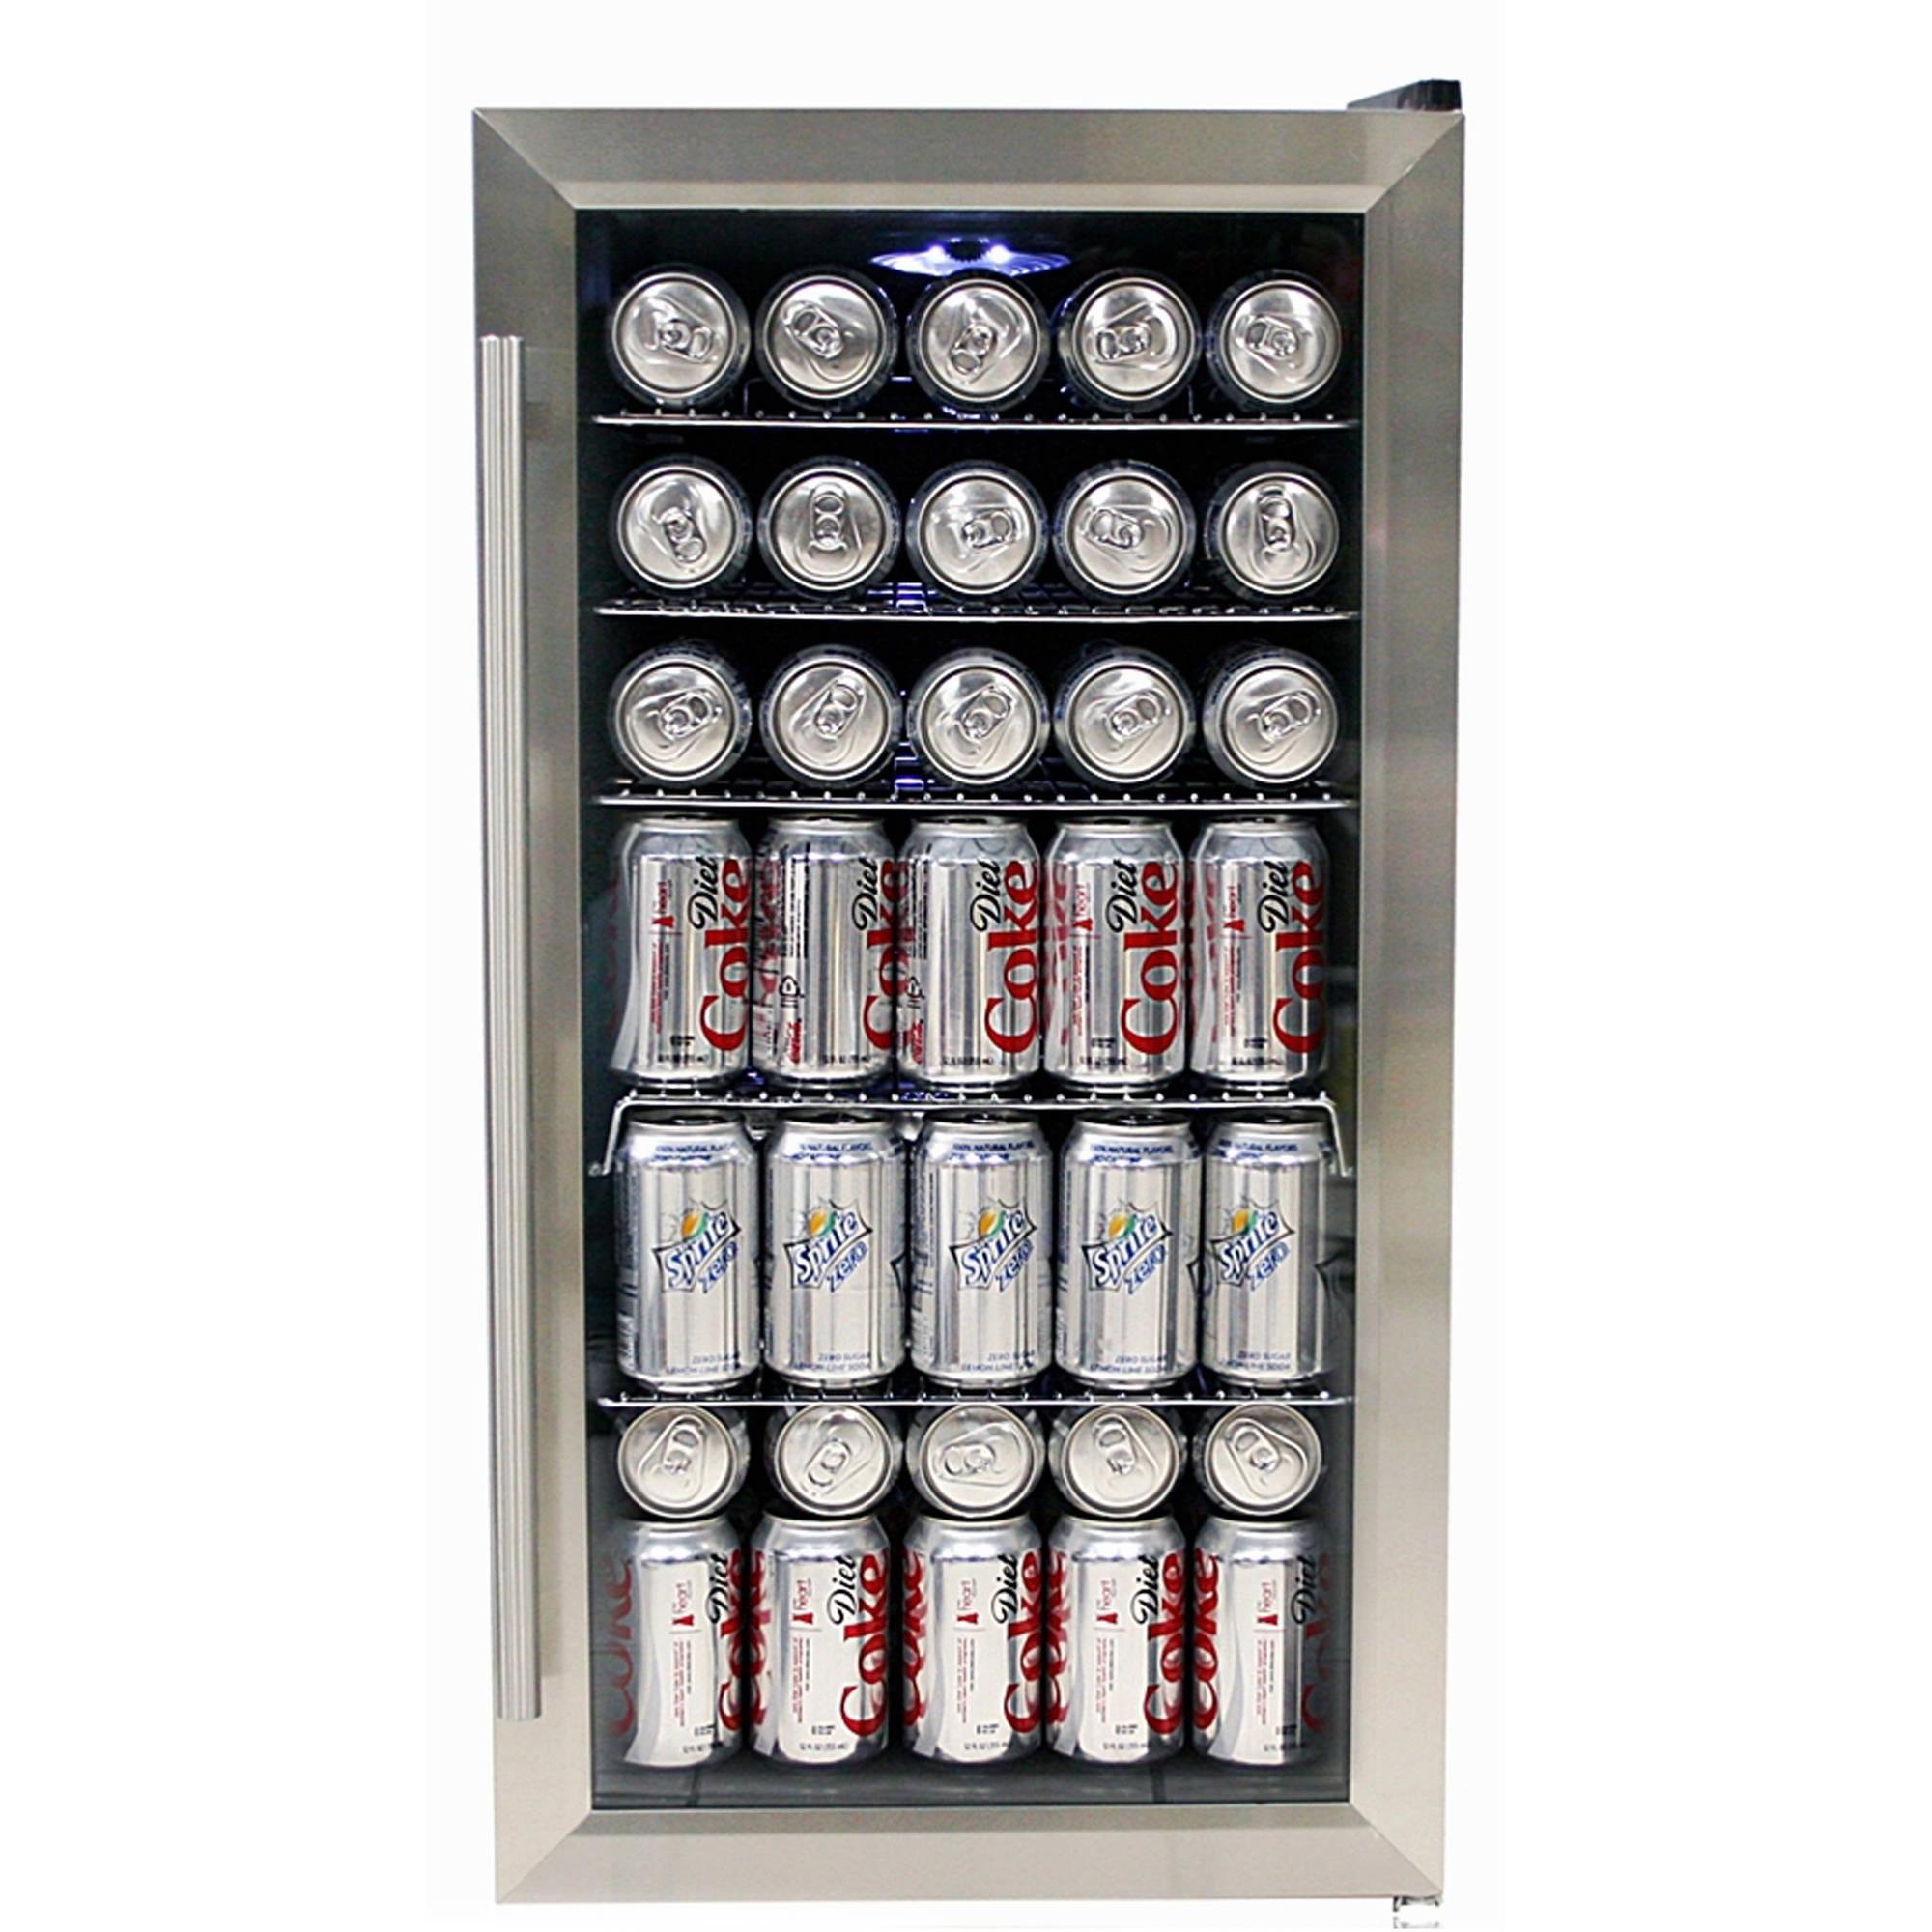 Whynter BR-125SD Stainless Steel Beverage Refrigerator